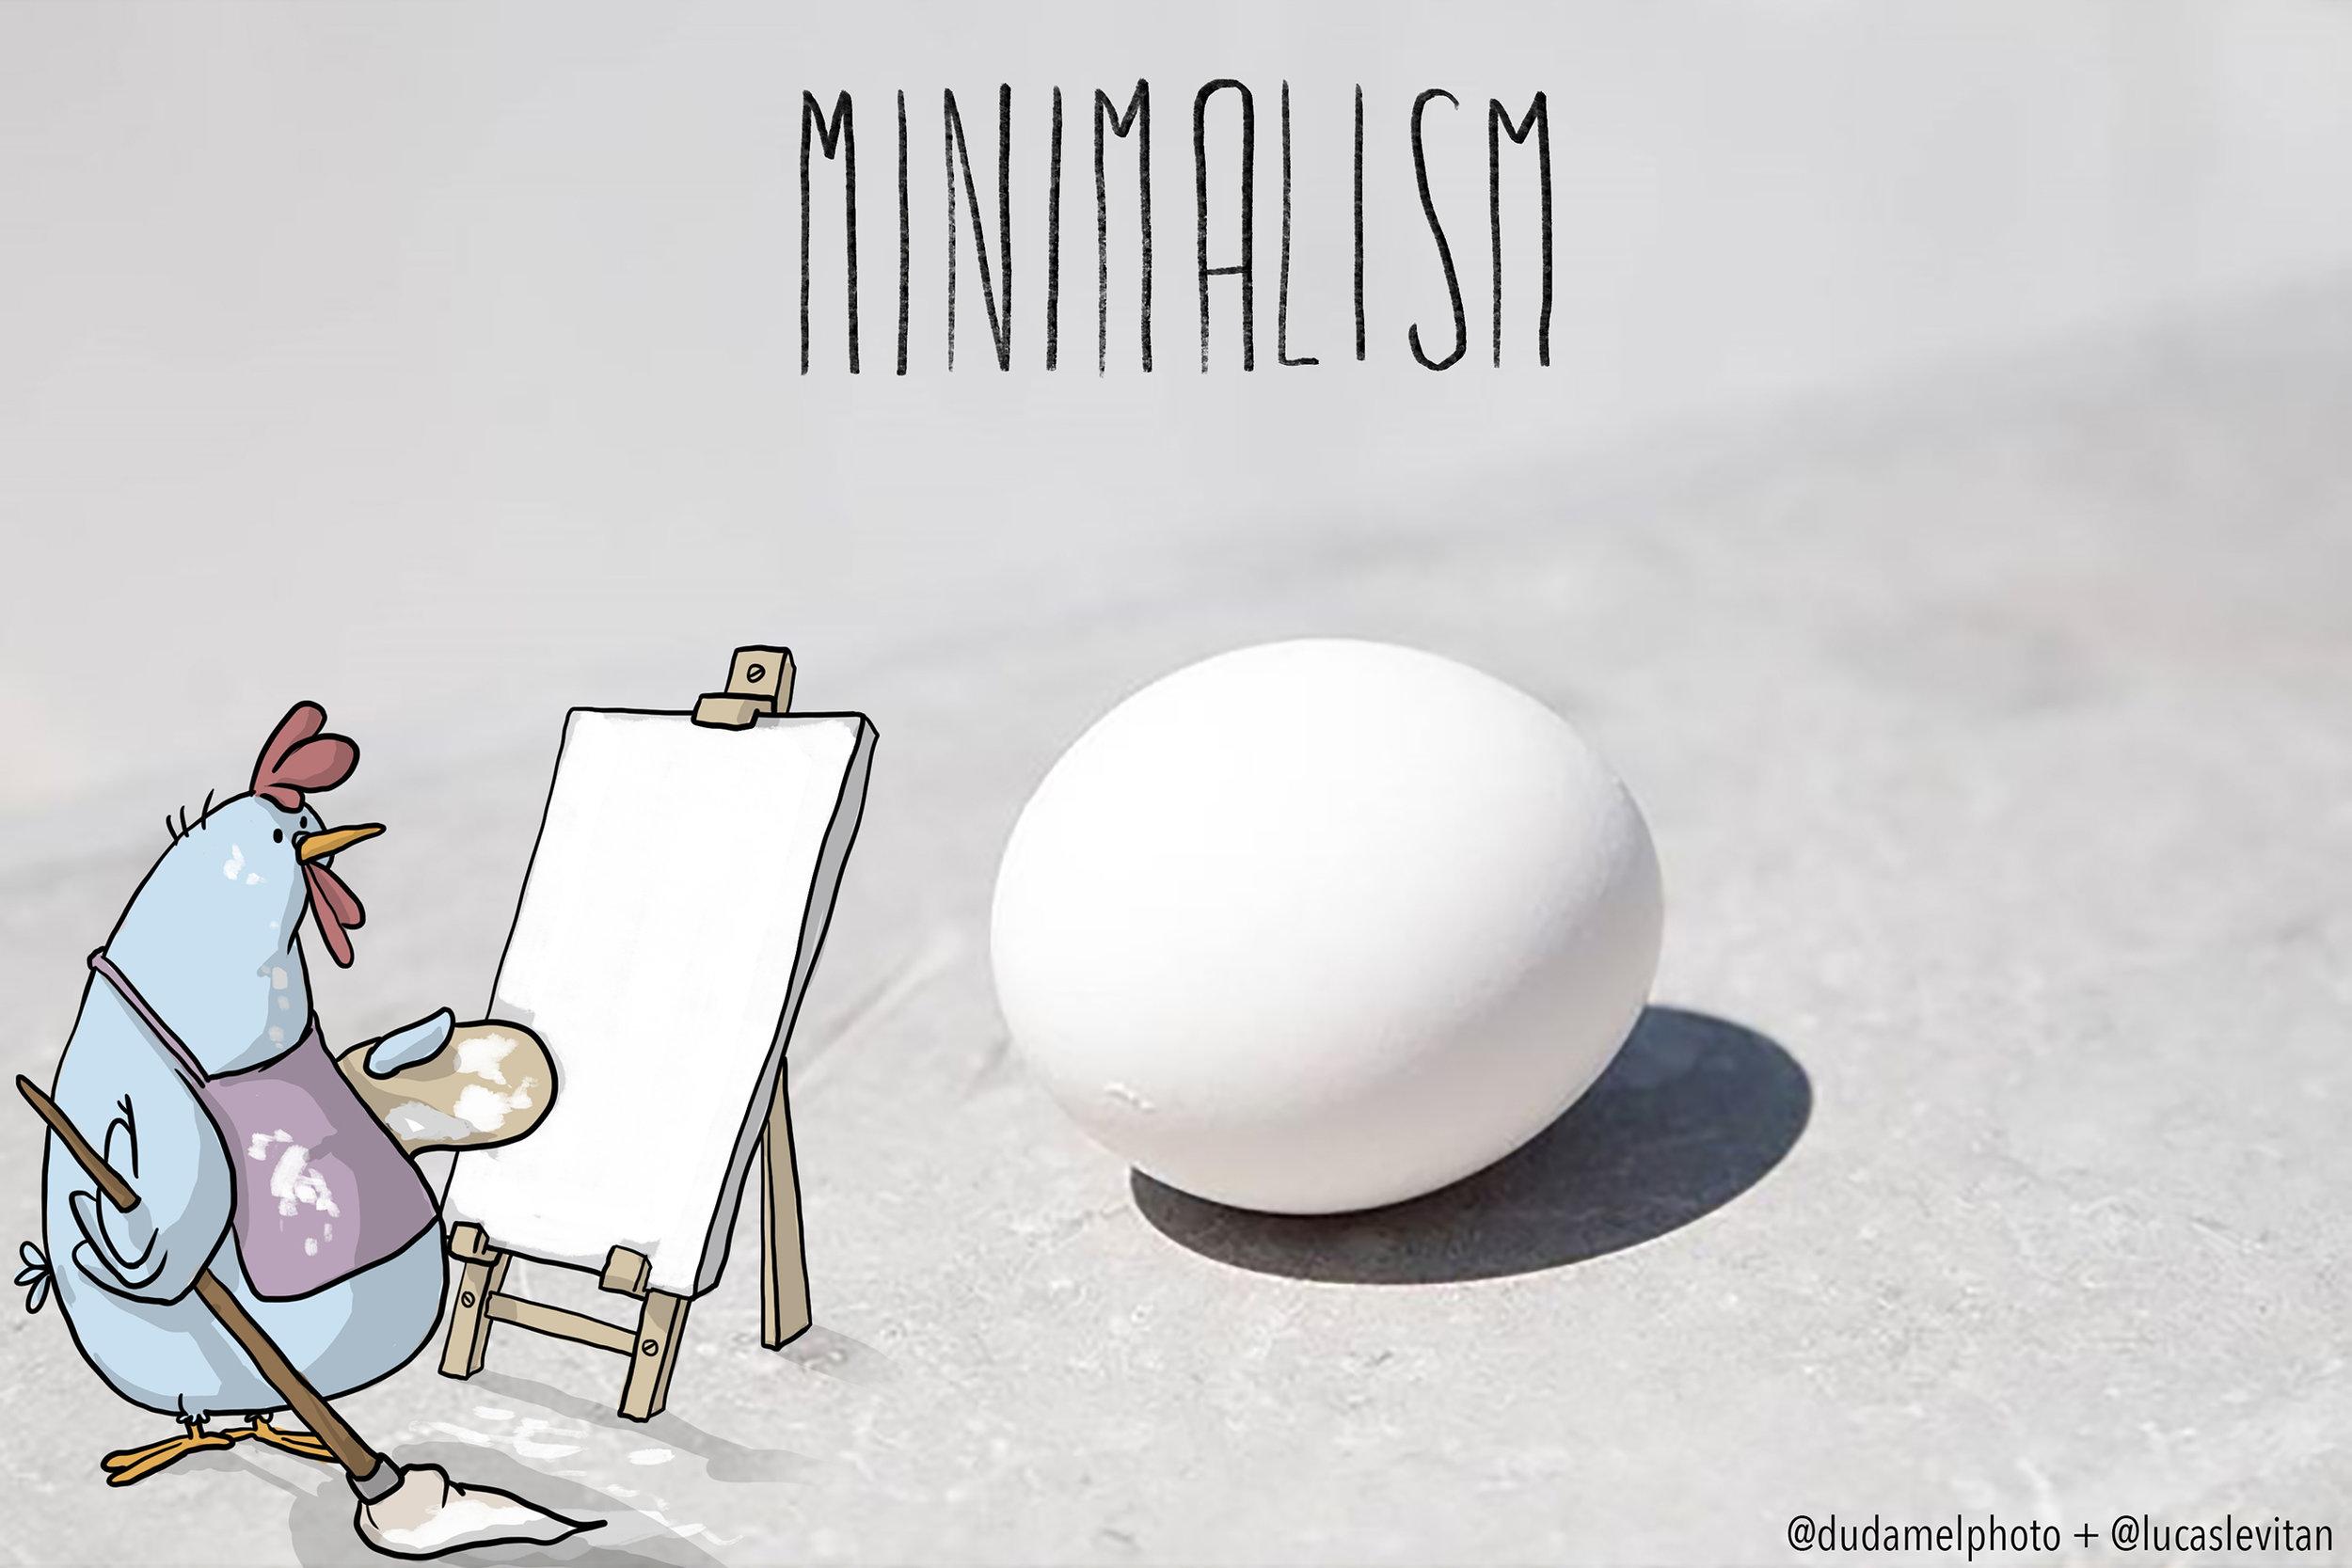 07dudamelphoto EGG 06 painter minimalism.jpg